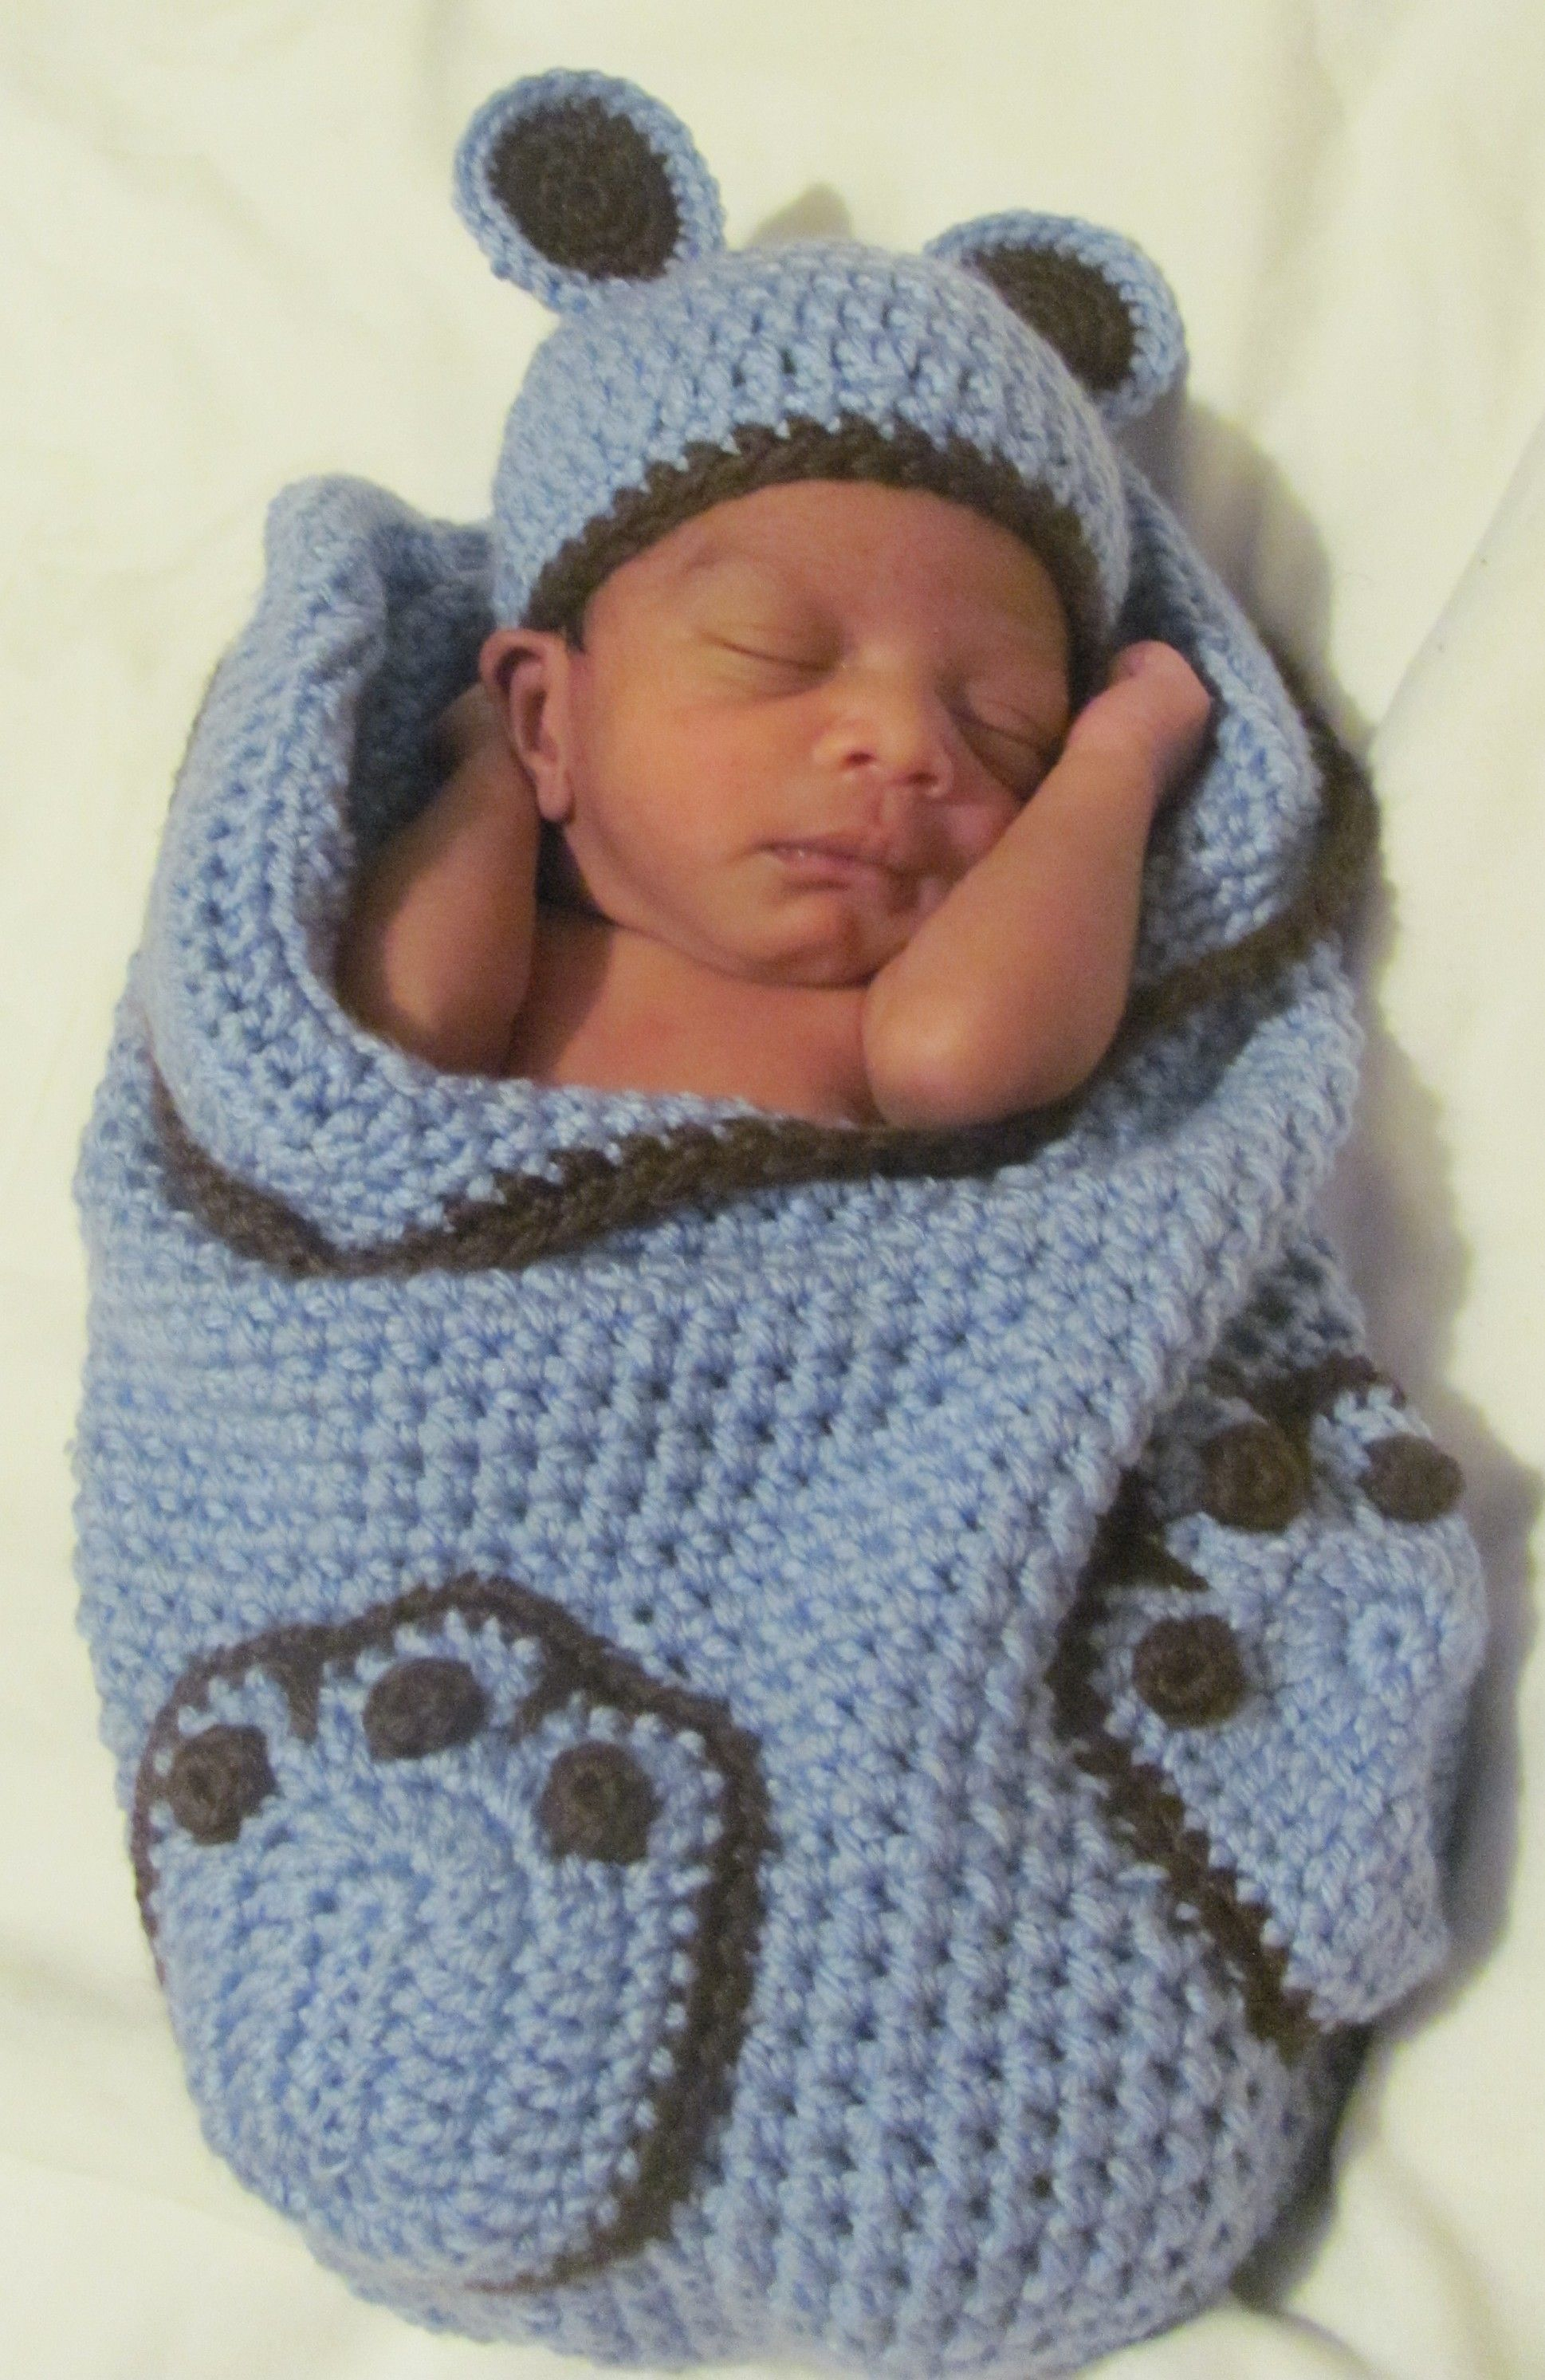 Portabebe oso | Crochet | Pinterest | Crochet teddy, Teddy bear and ...